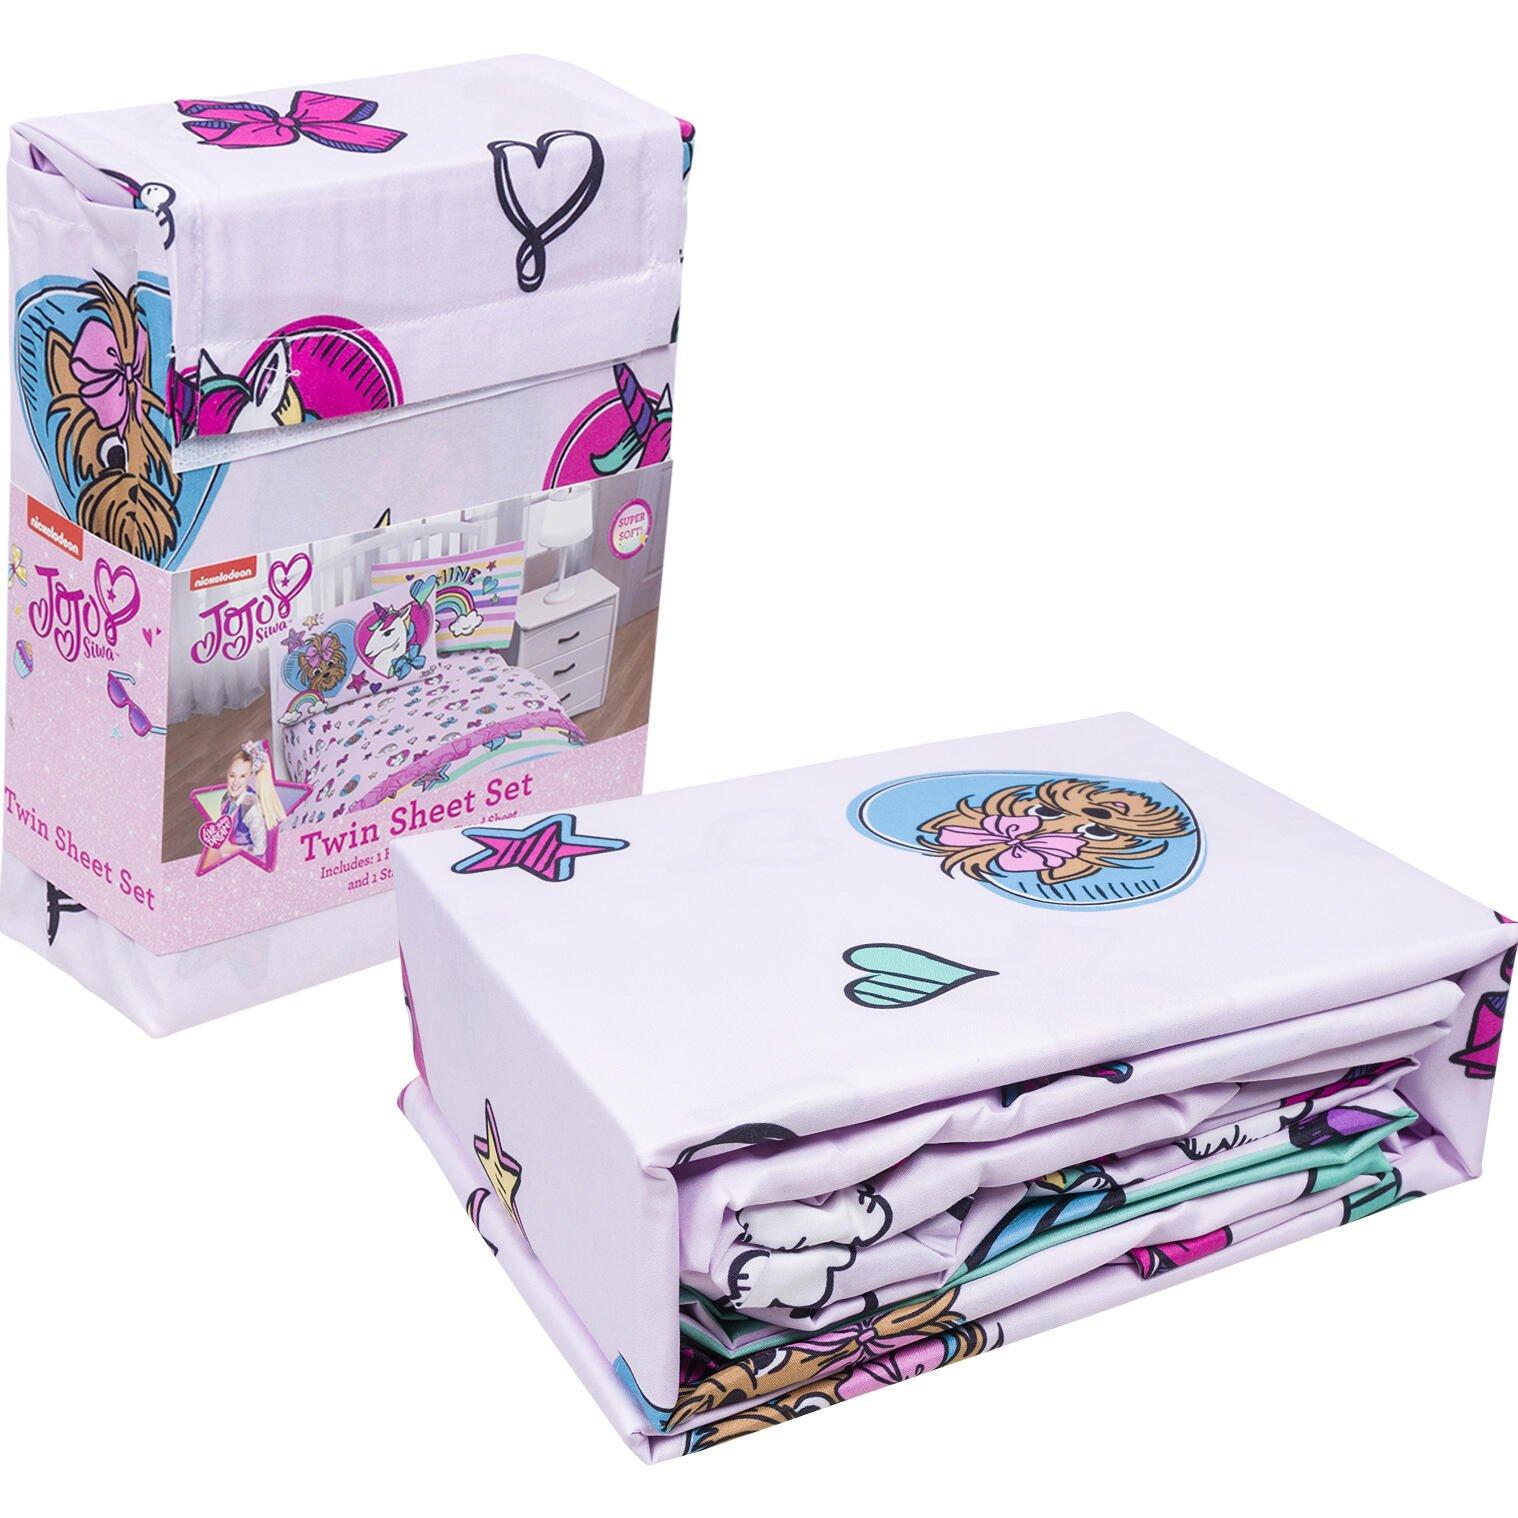 Nickelodeon JoJo Siwa Kids Pink Rainbow Unicorn Bedding Twin Sheets Set for Girls, 3pc